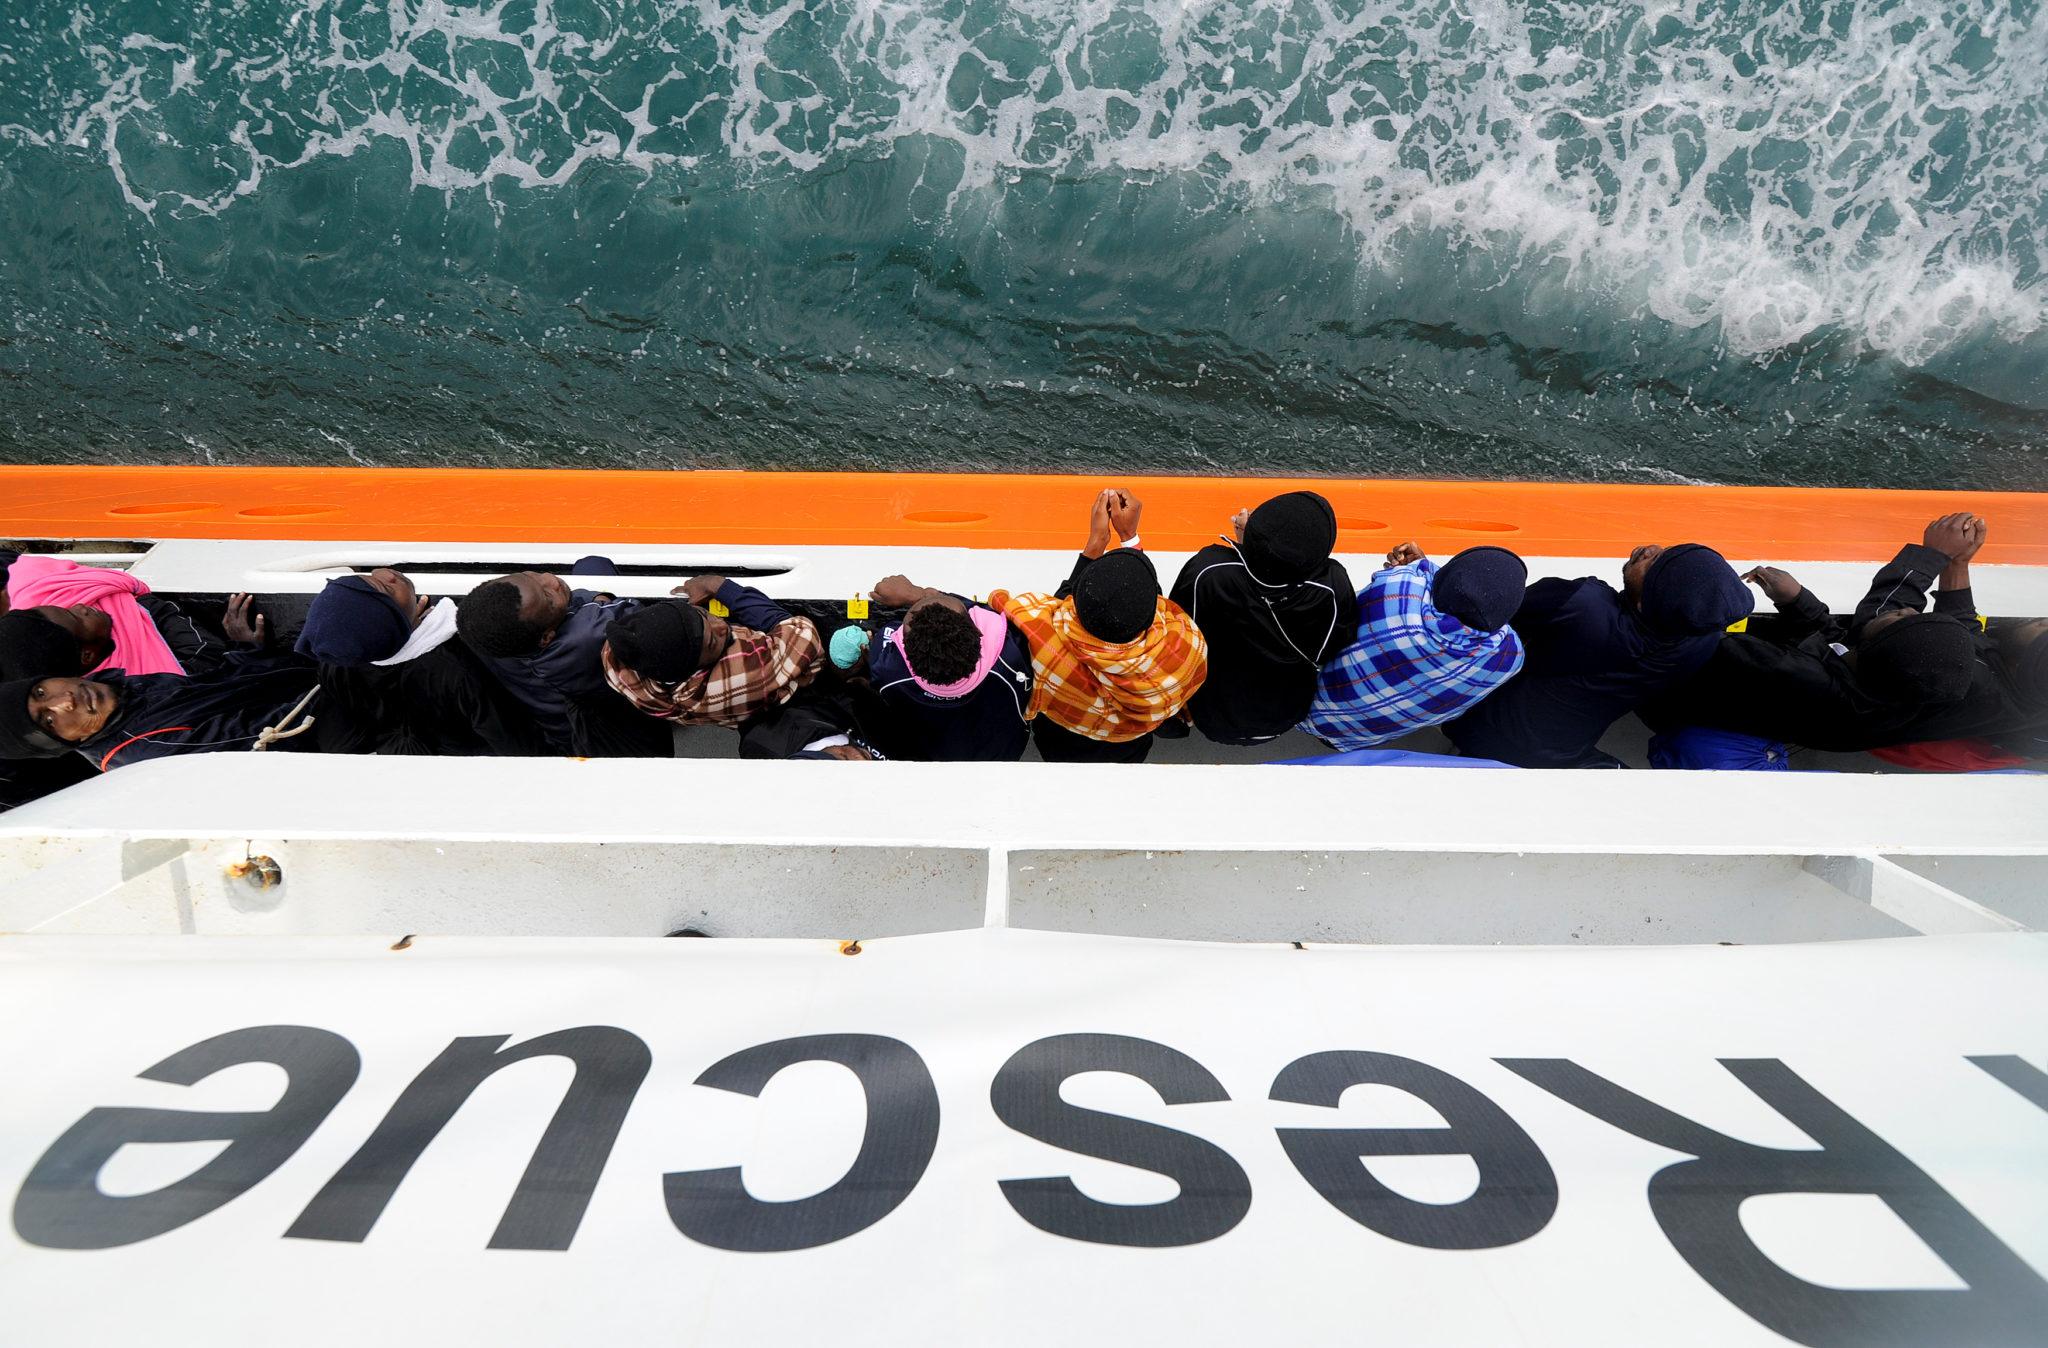 Italy/EU: Response from Kumi Naidoo to termination of operations of Aquarius rescue ship